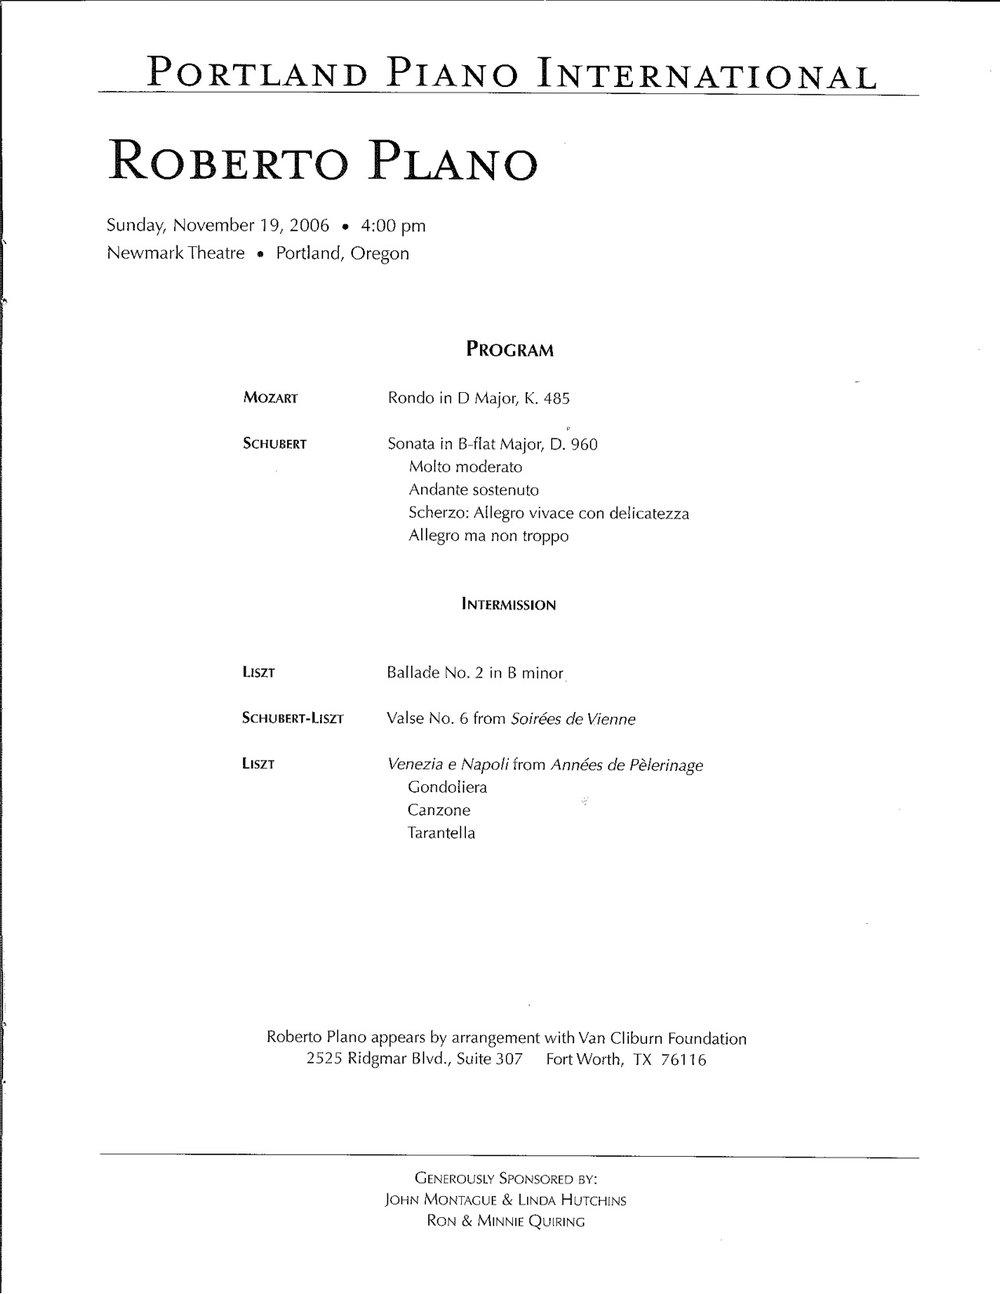 Plano_Program2.jpg